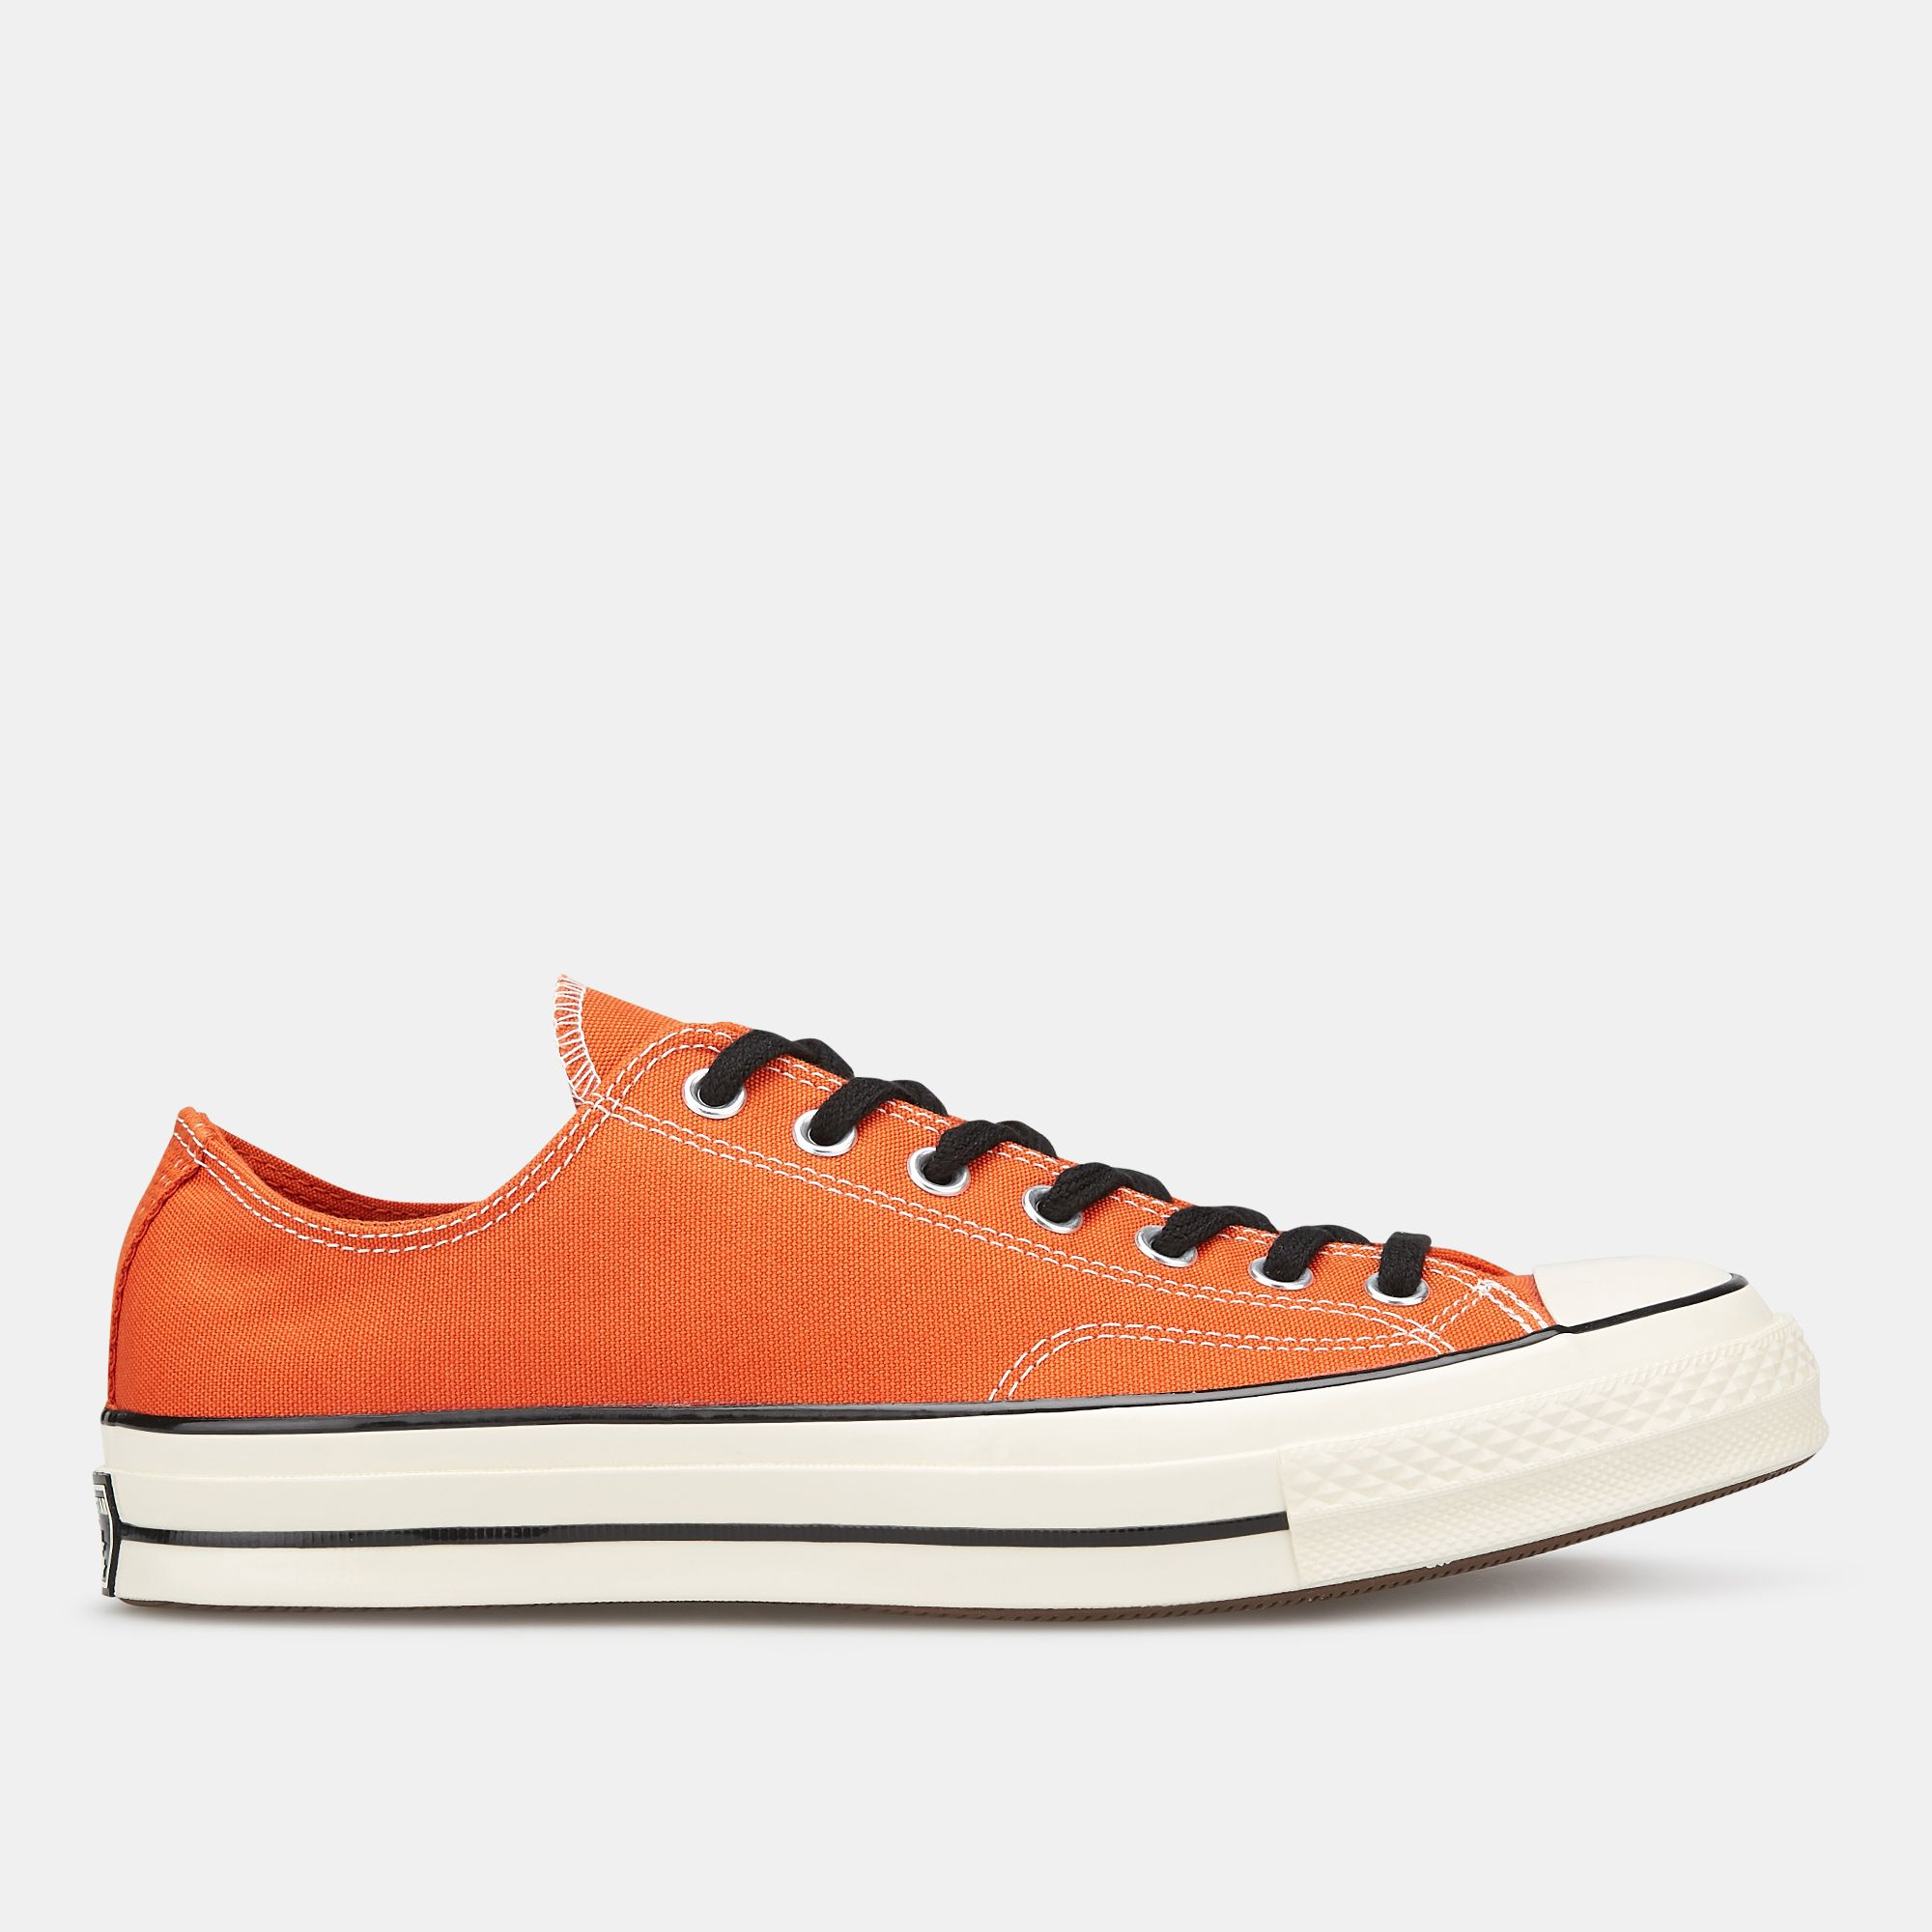 Converse Chuck 70 Ox Shoe